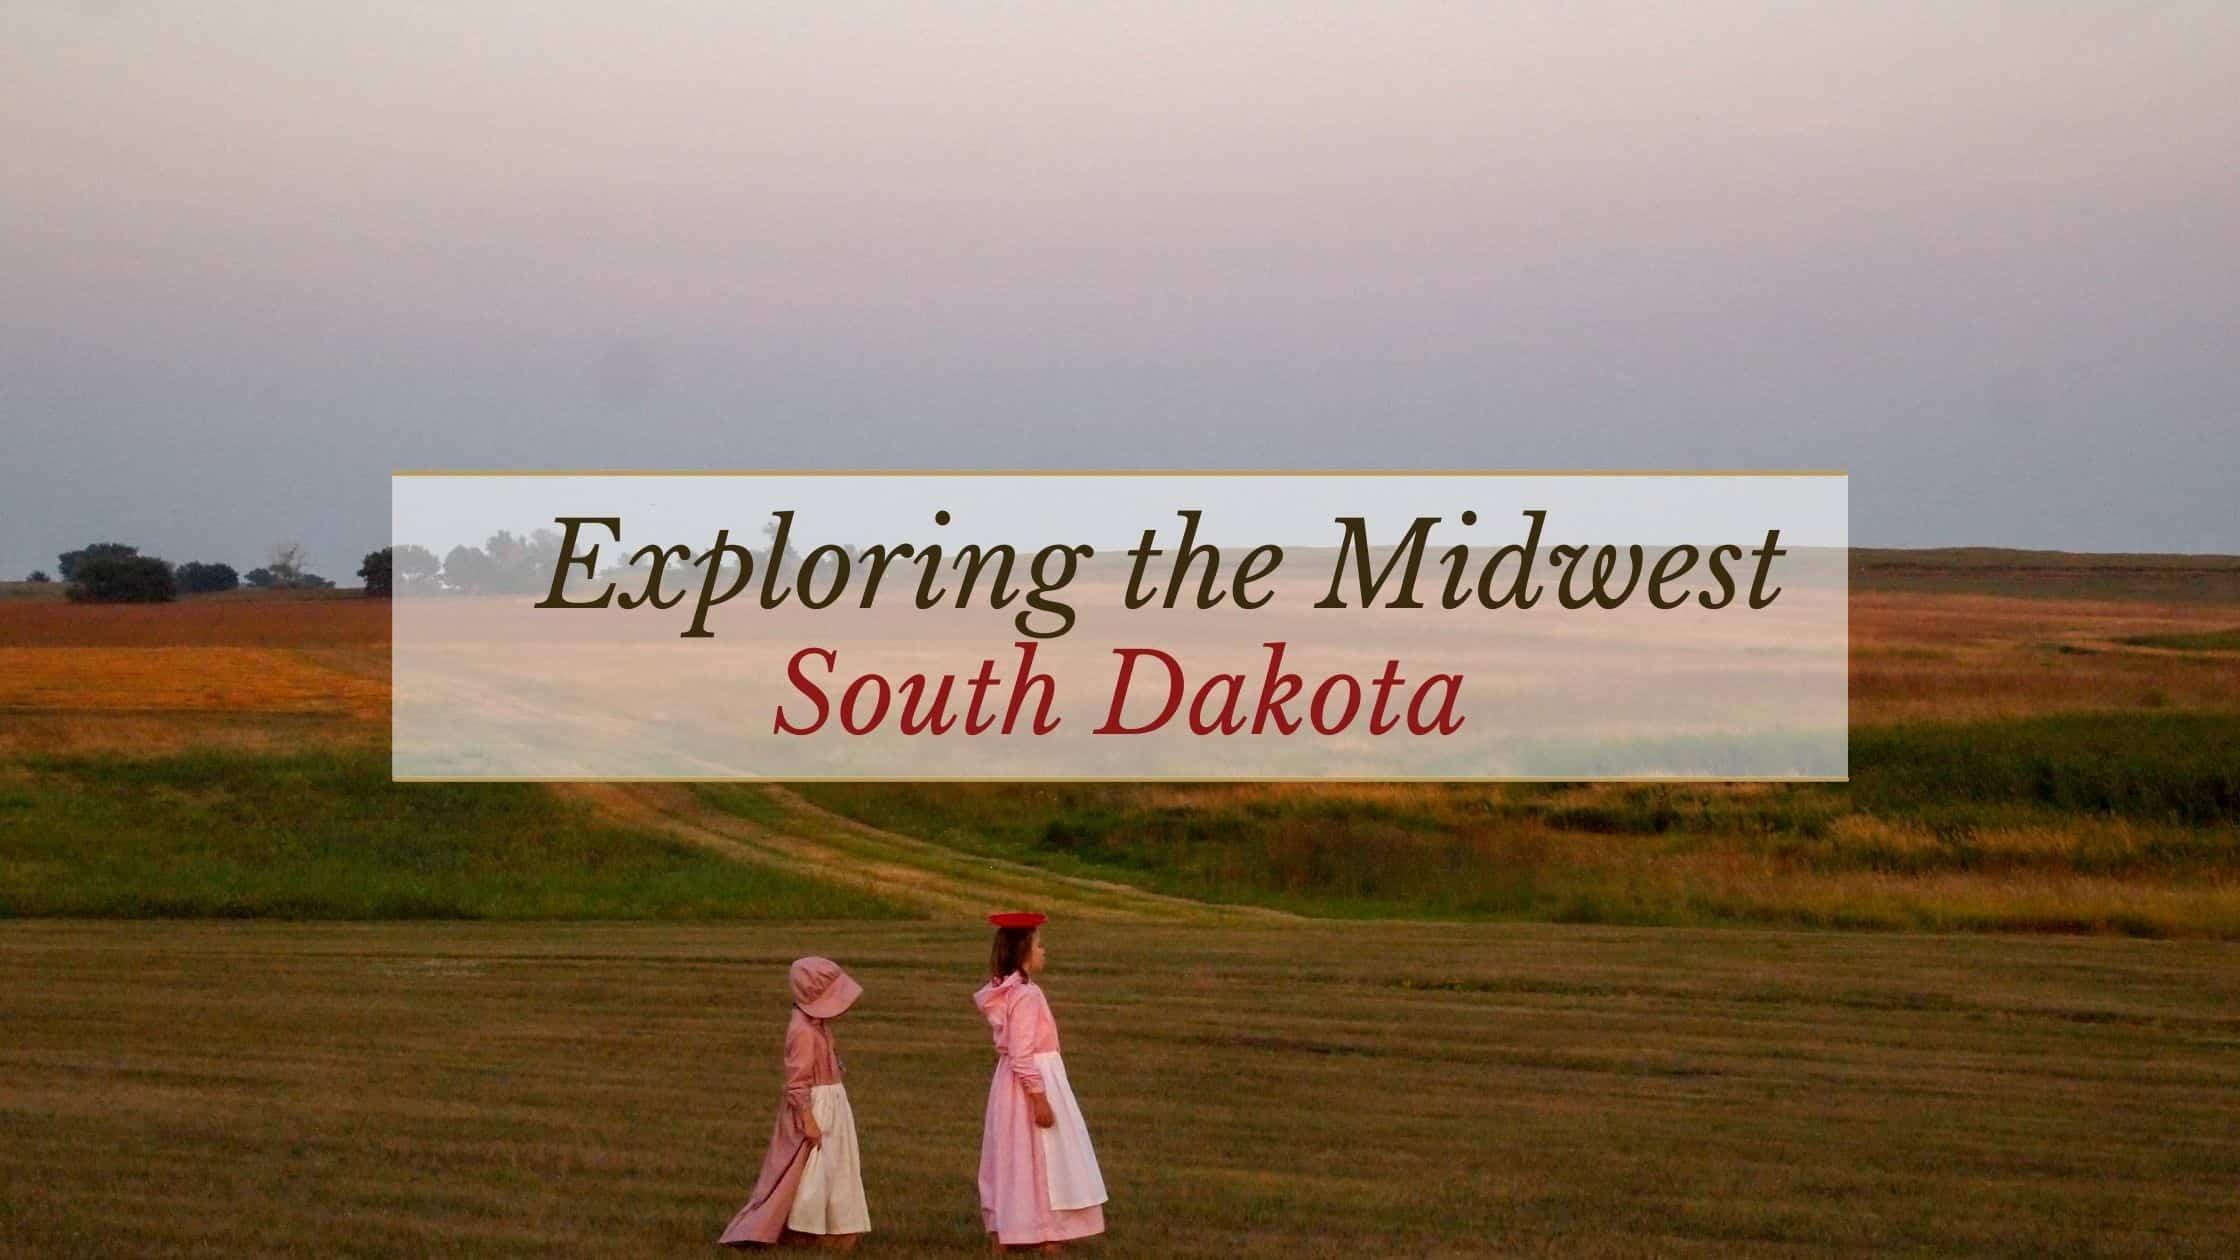 Travel South Dakota | Exploring the Midwest Episode 4